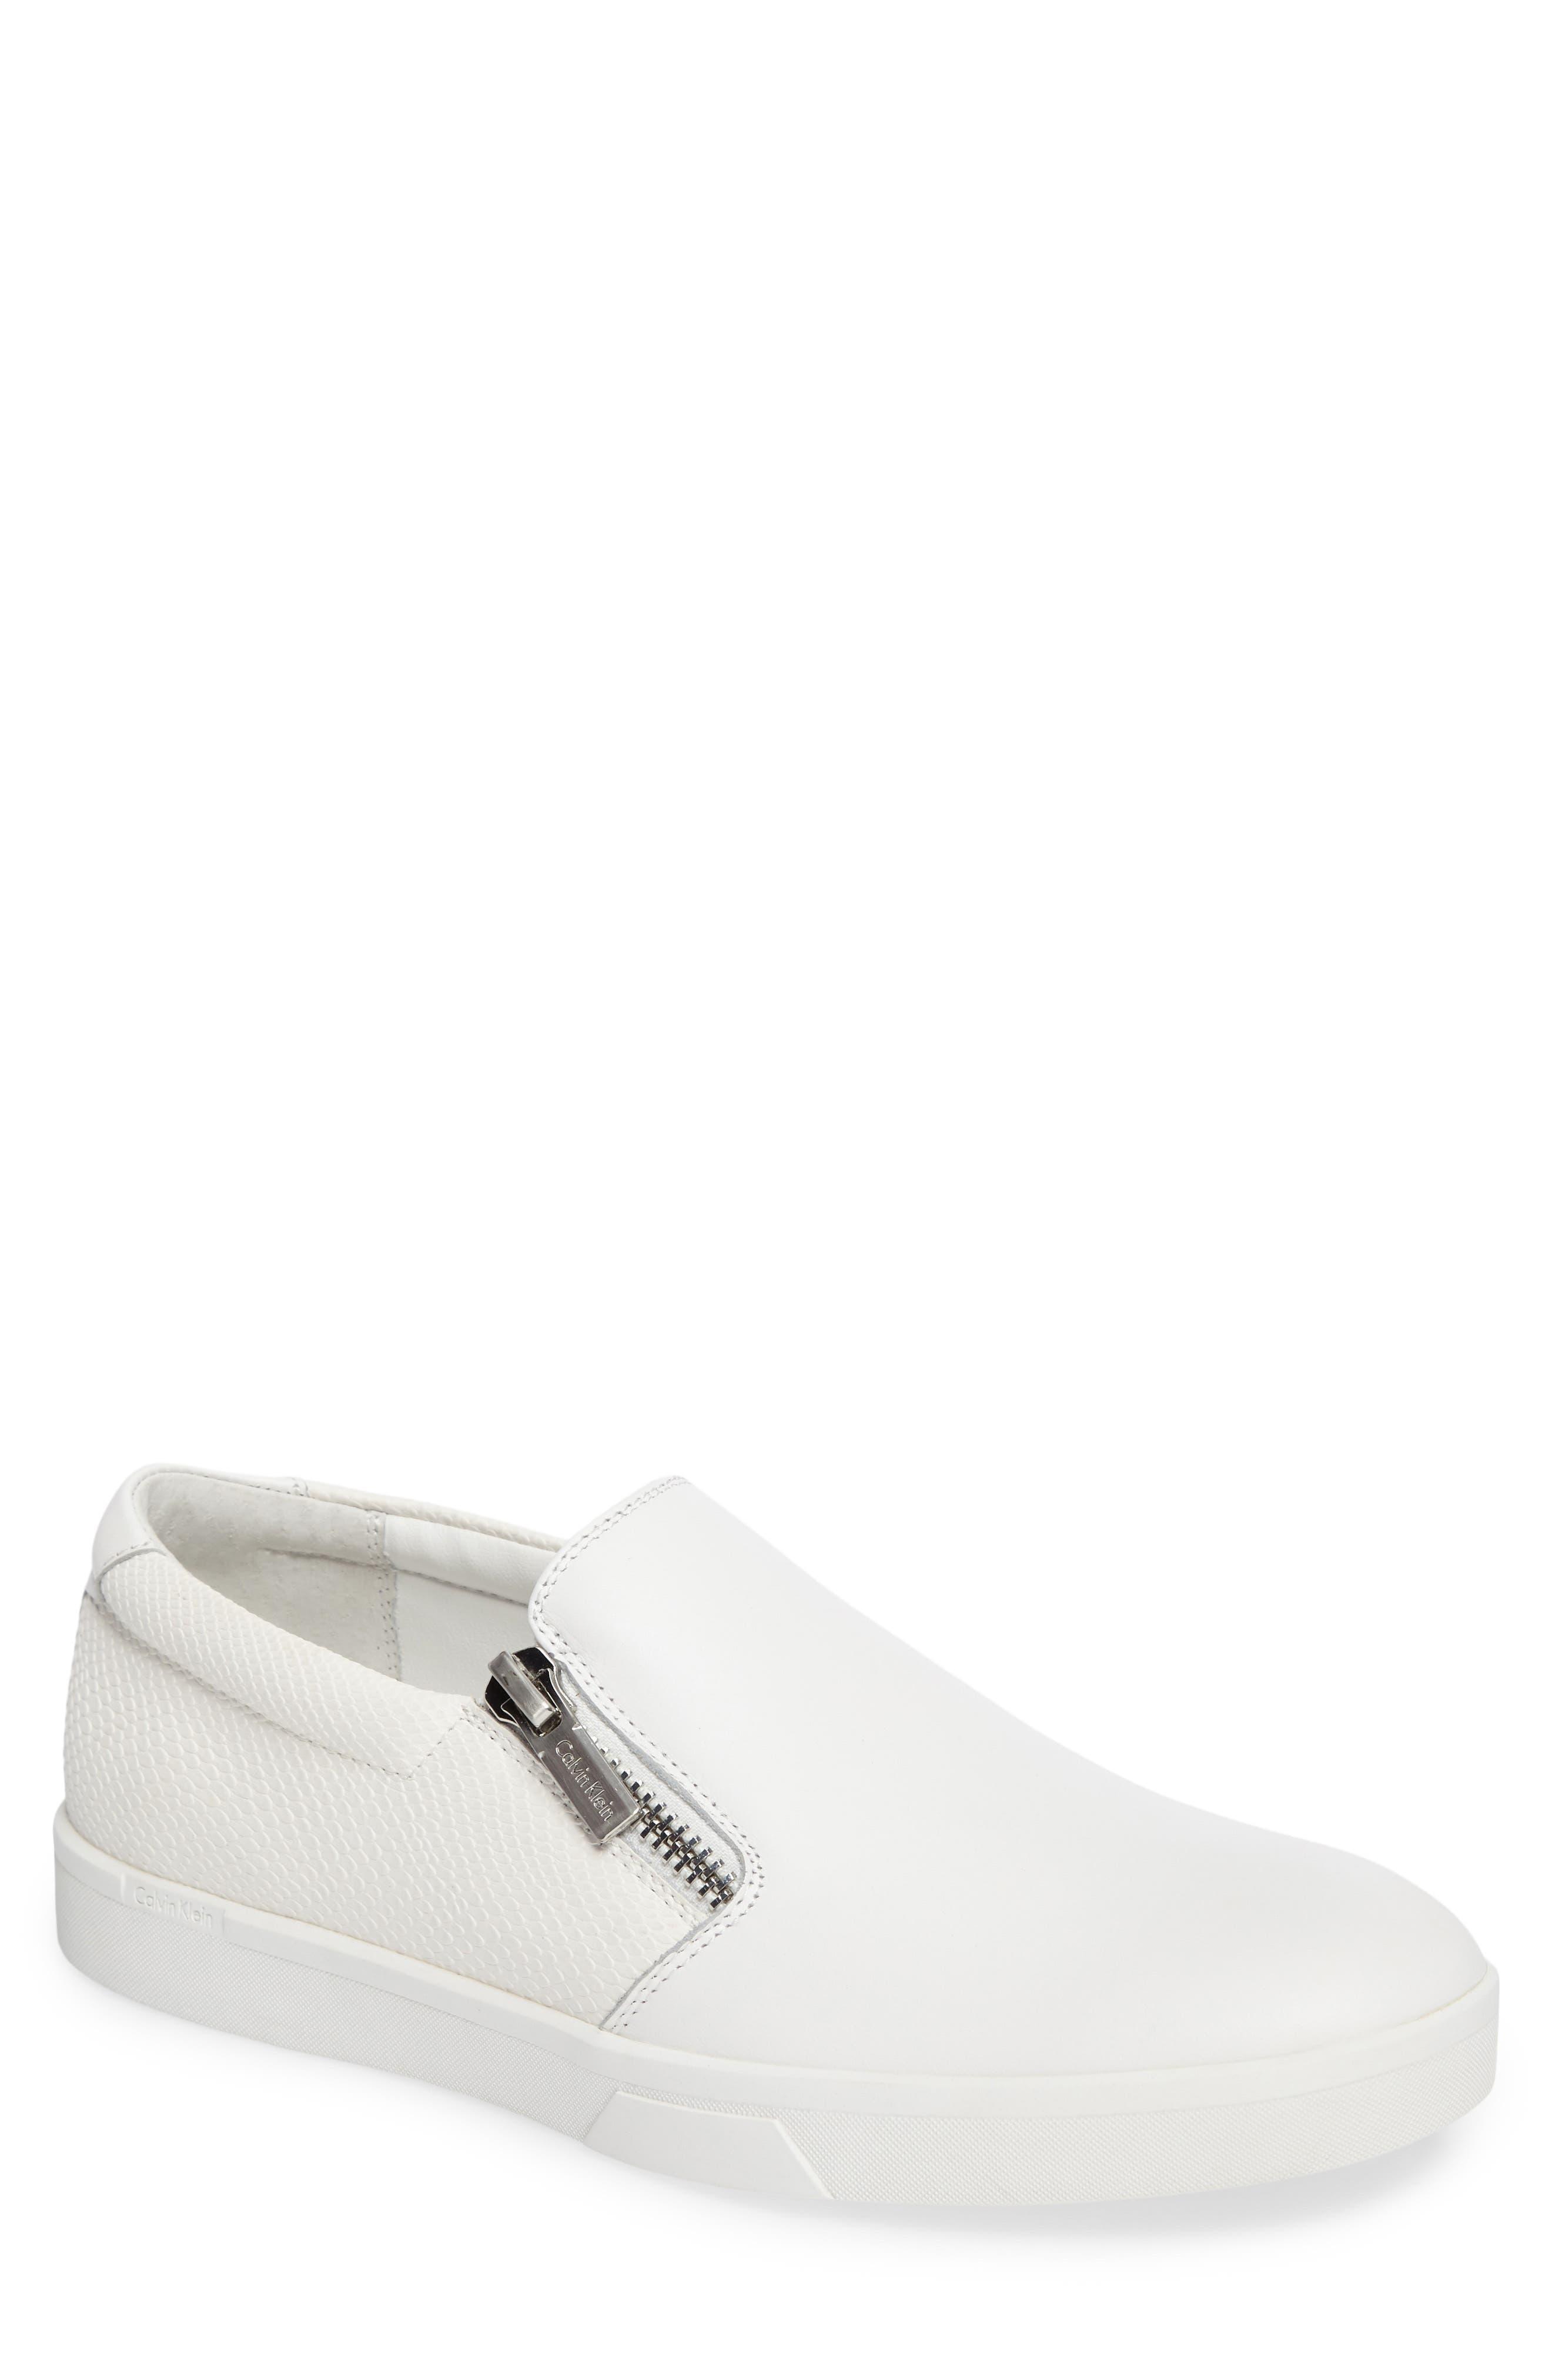 Ibiza Slip-On Zip Sneaker,                             Main thumbnail 2, color,